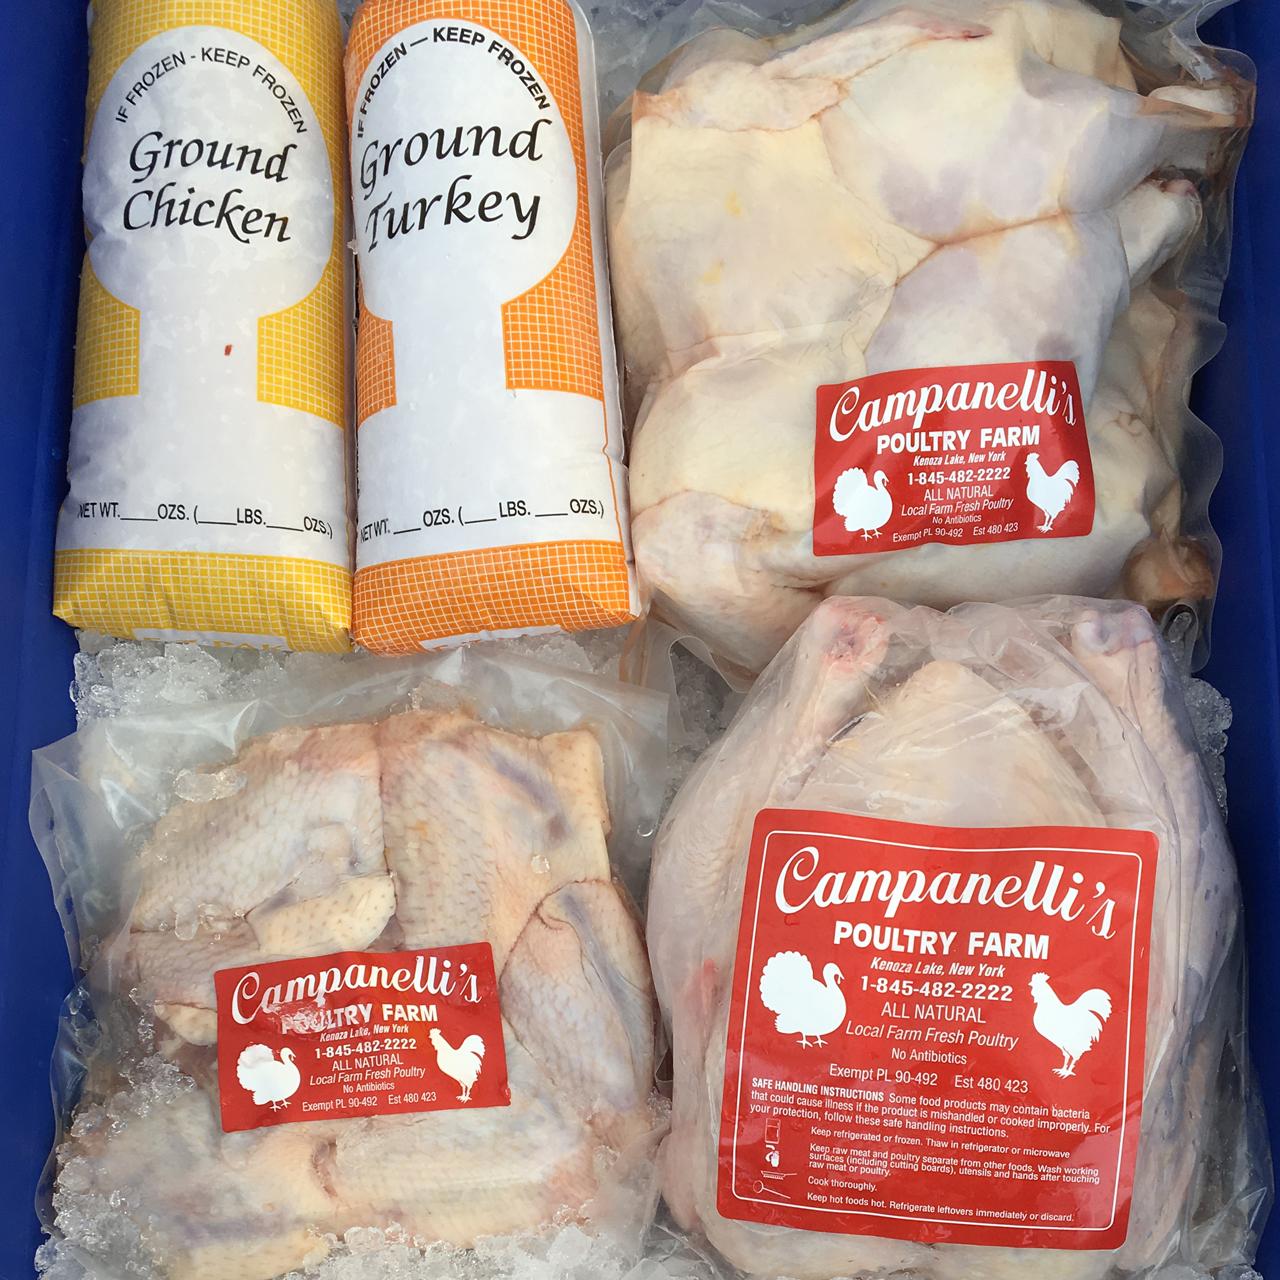 Campanelli's Poultry Farm